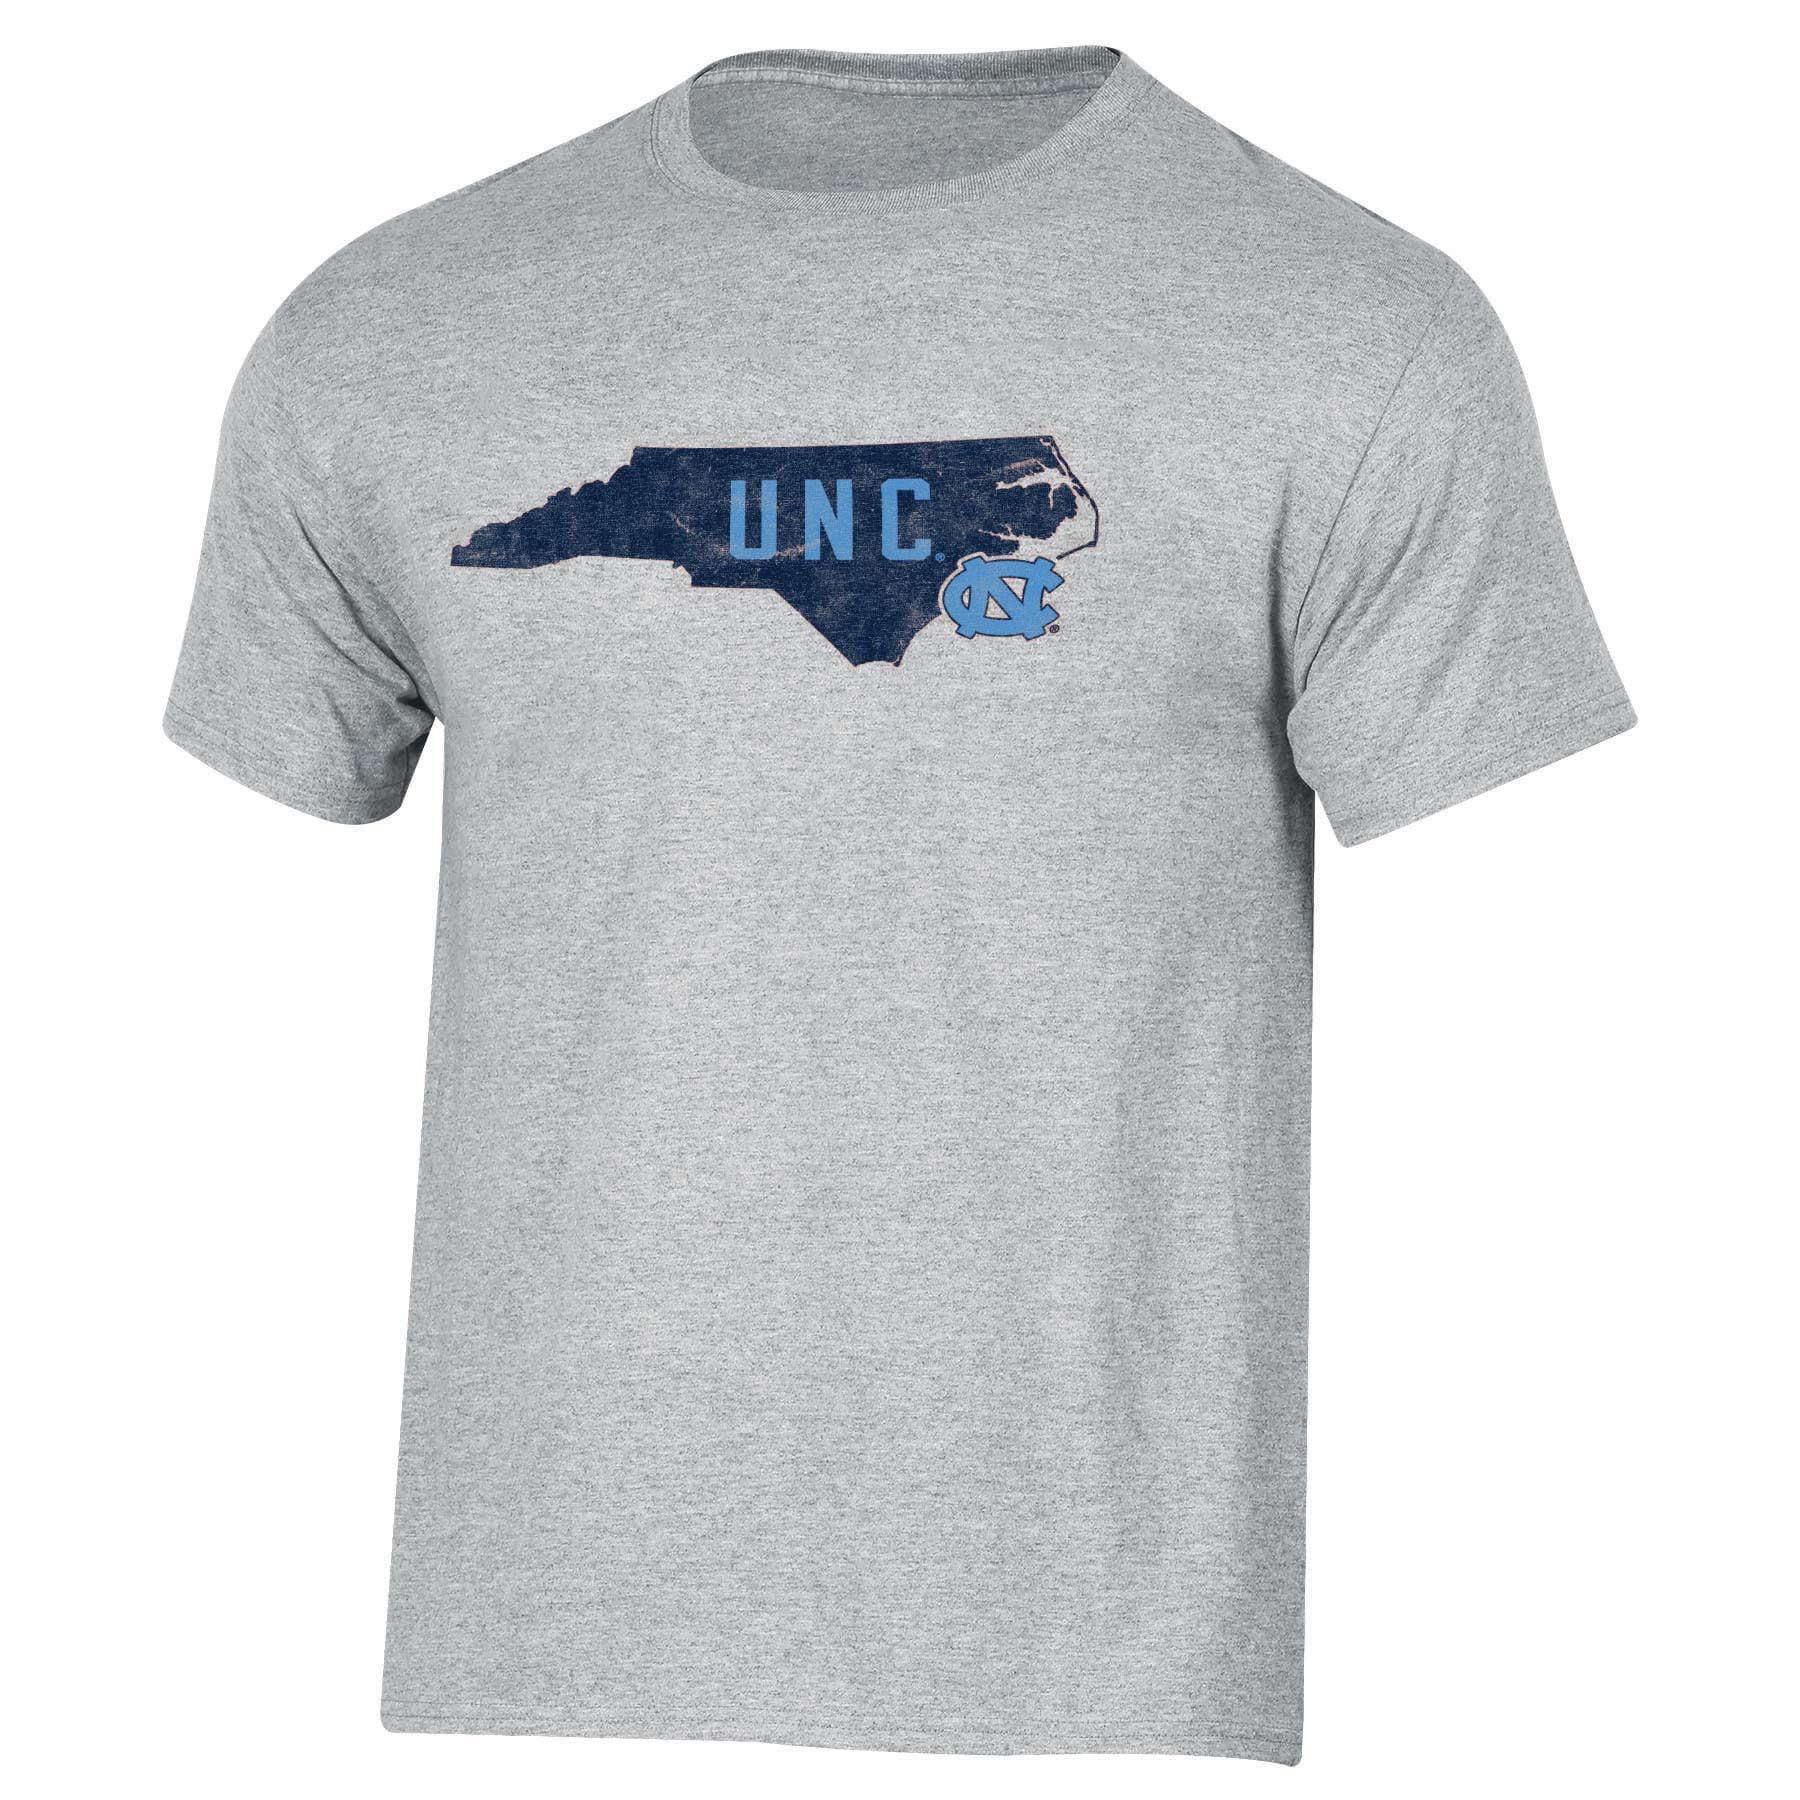 Men's Russell Heathered Gray North Carolina Tar Heels Inner-State T-Shirt